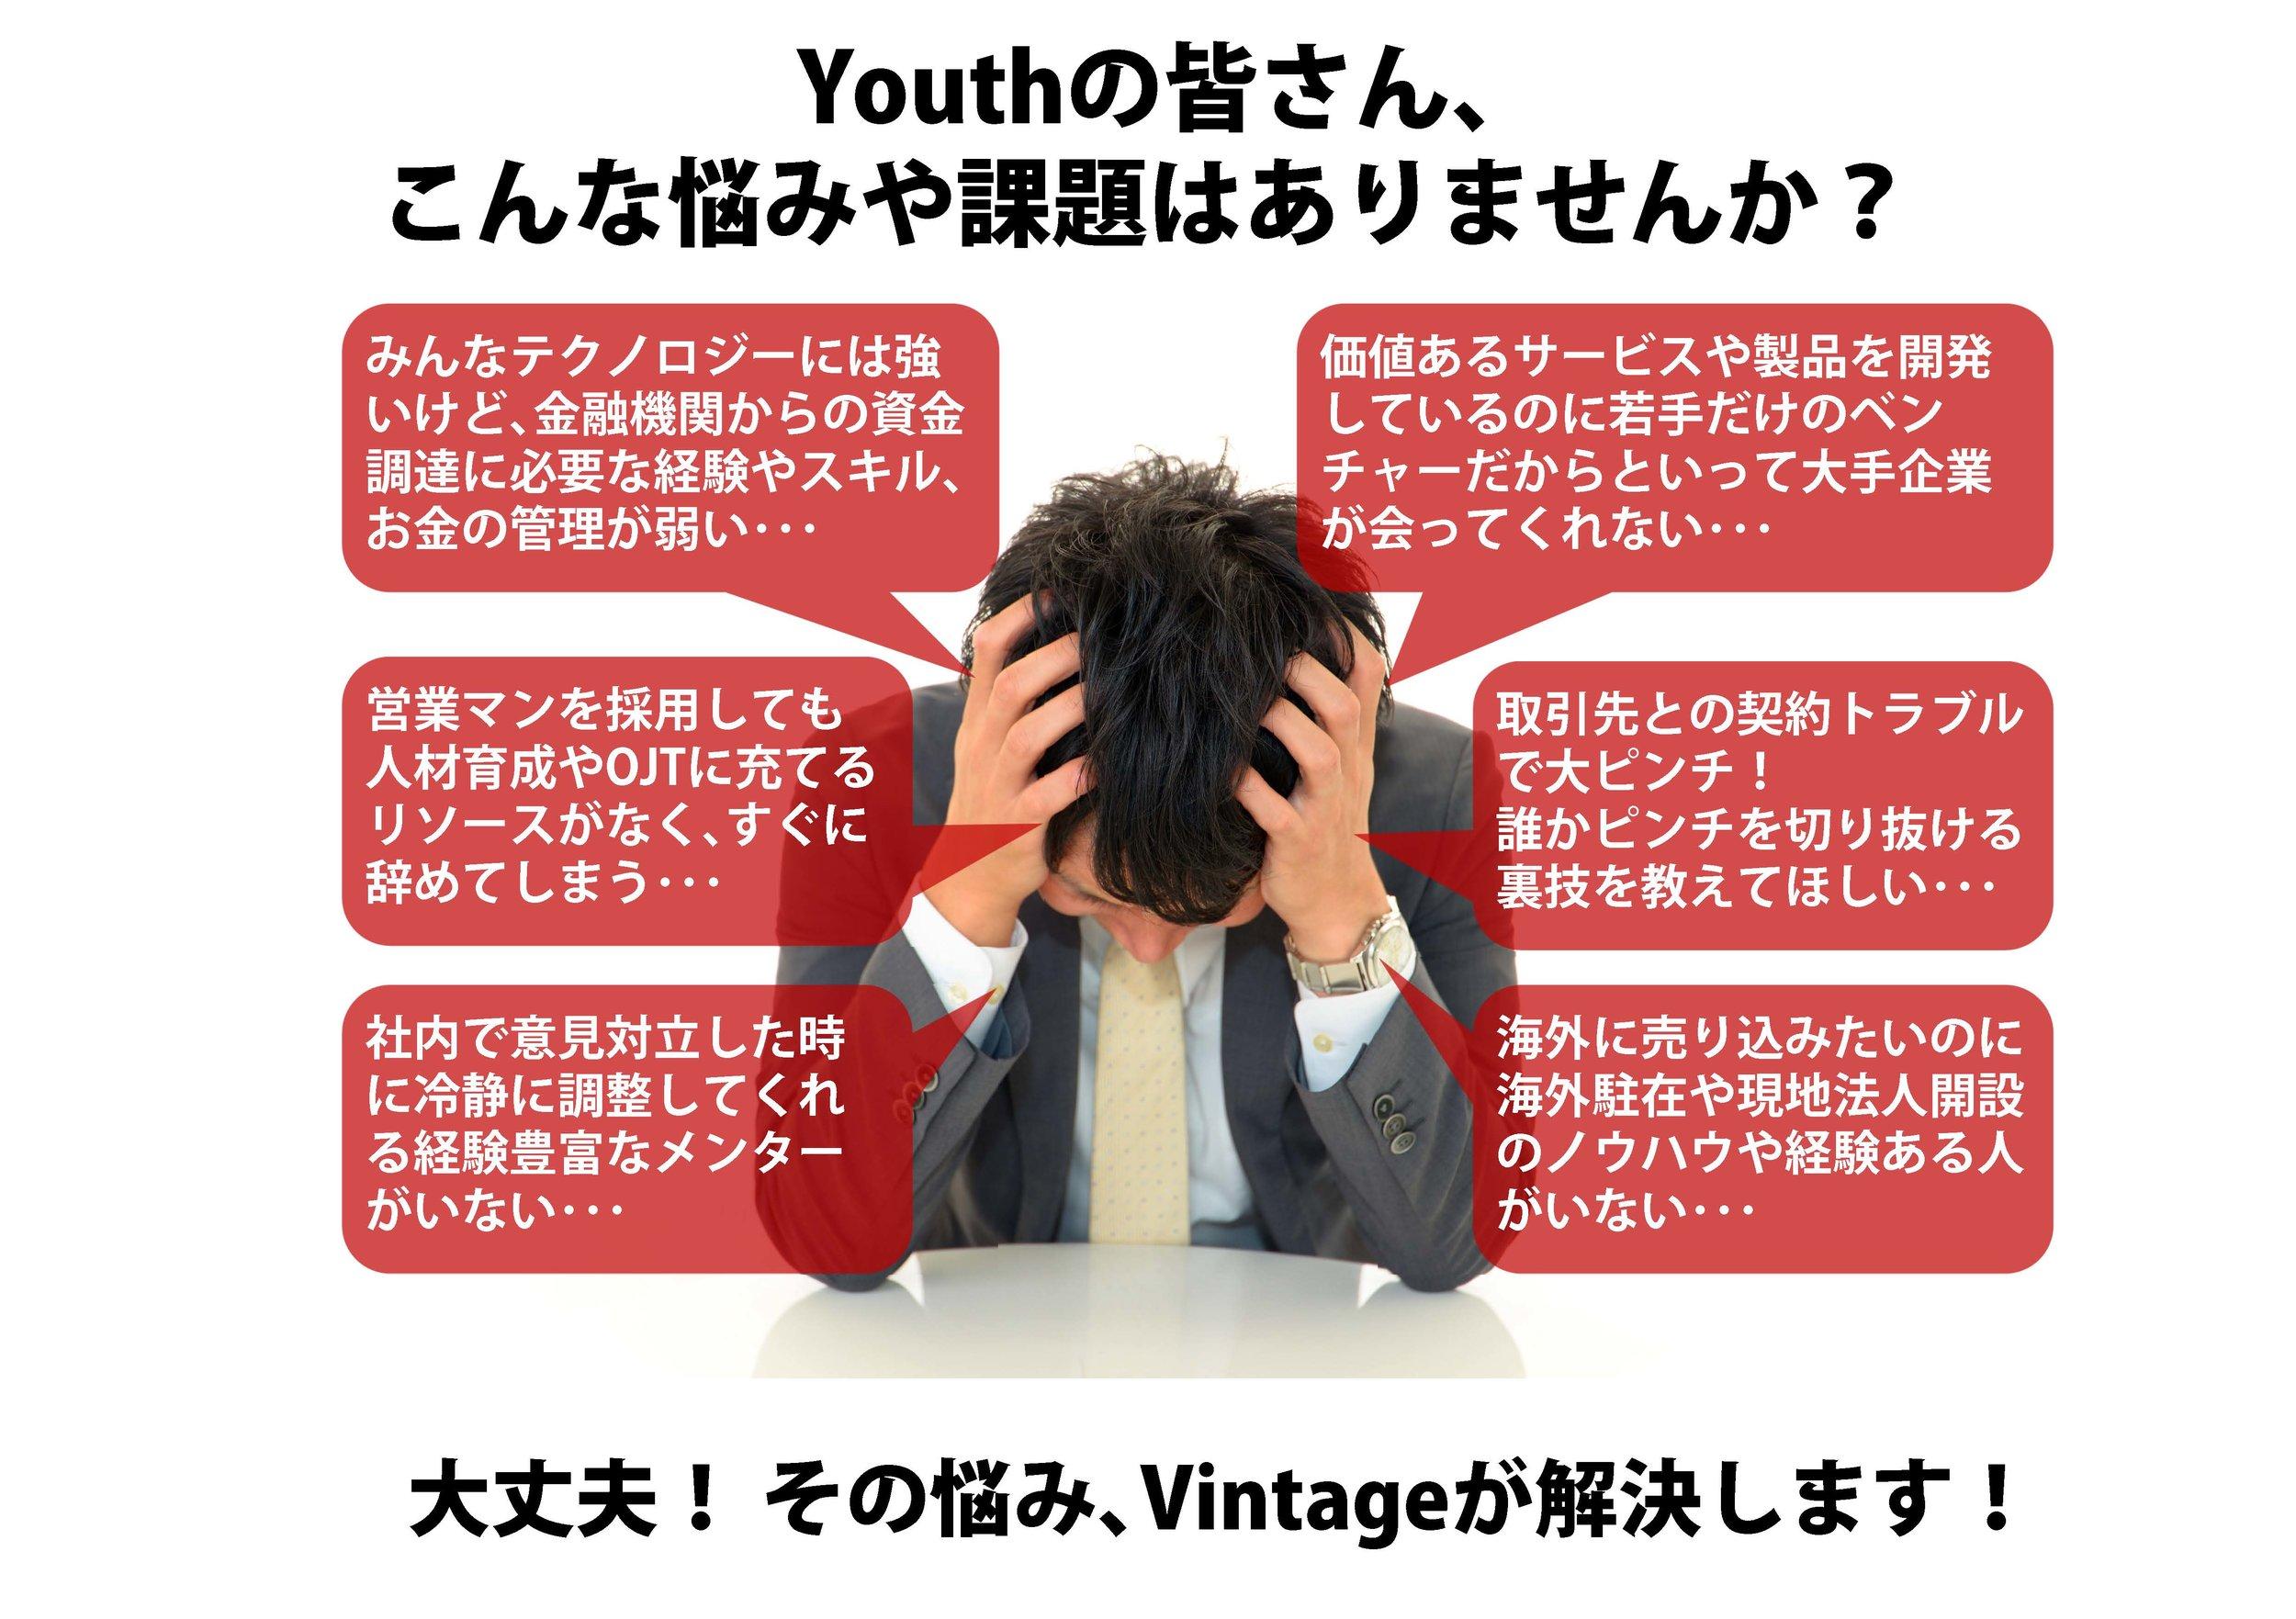 201810_Vintage事業プレゼン_youth.jpg